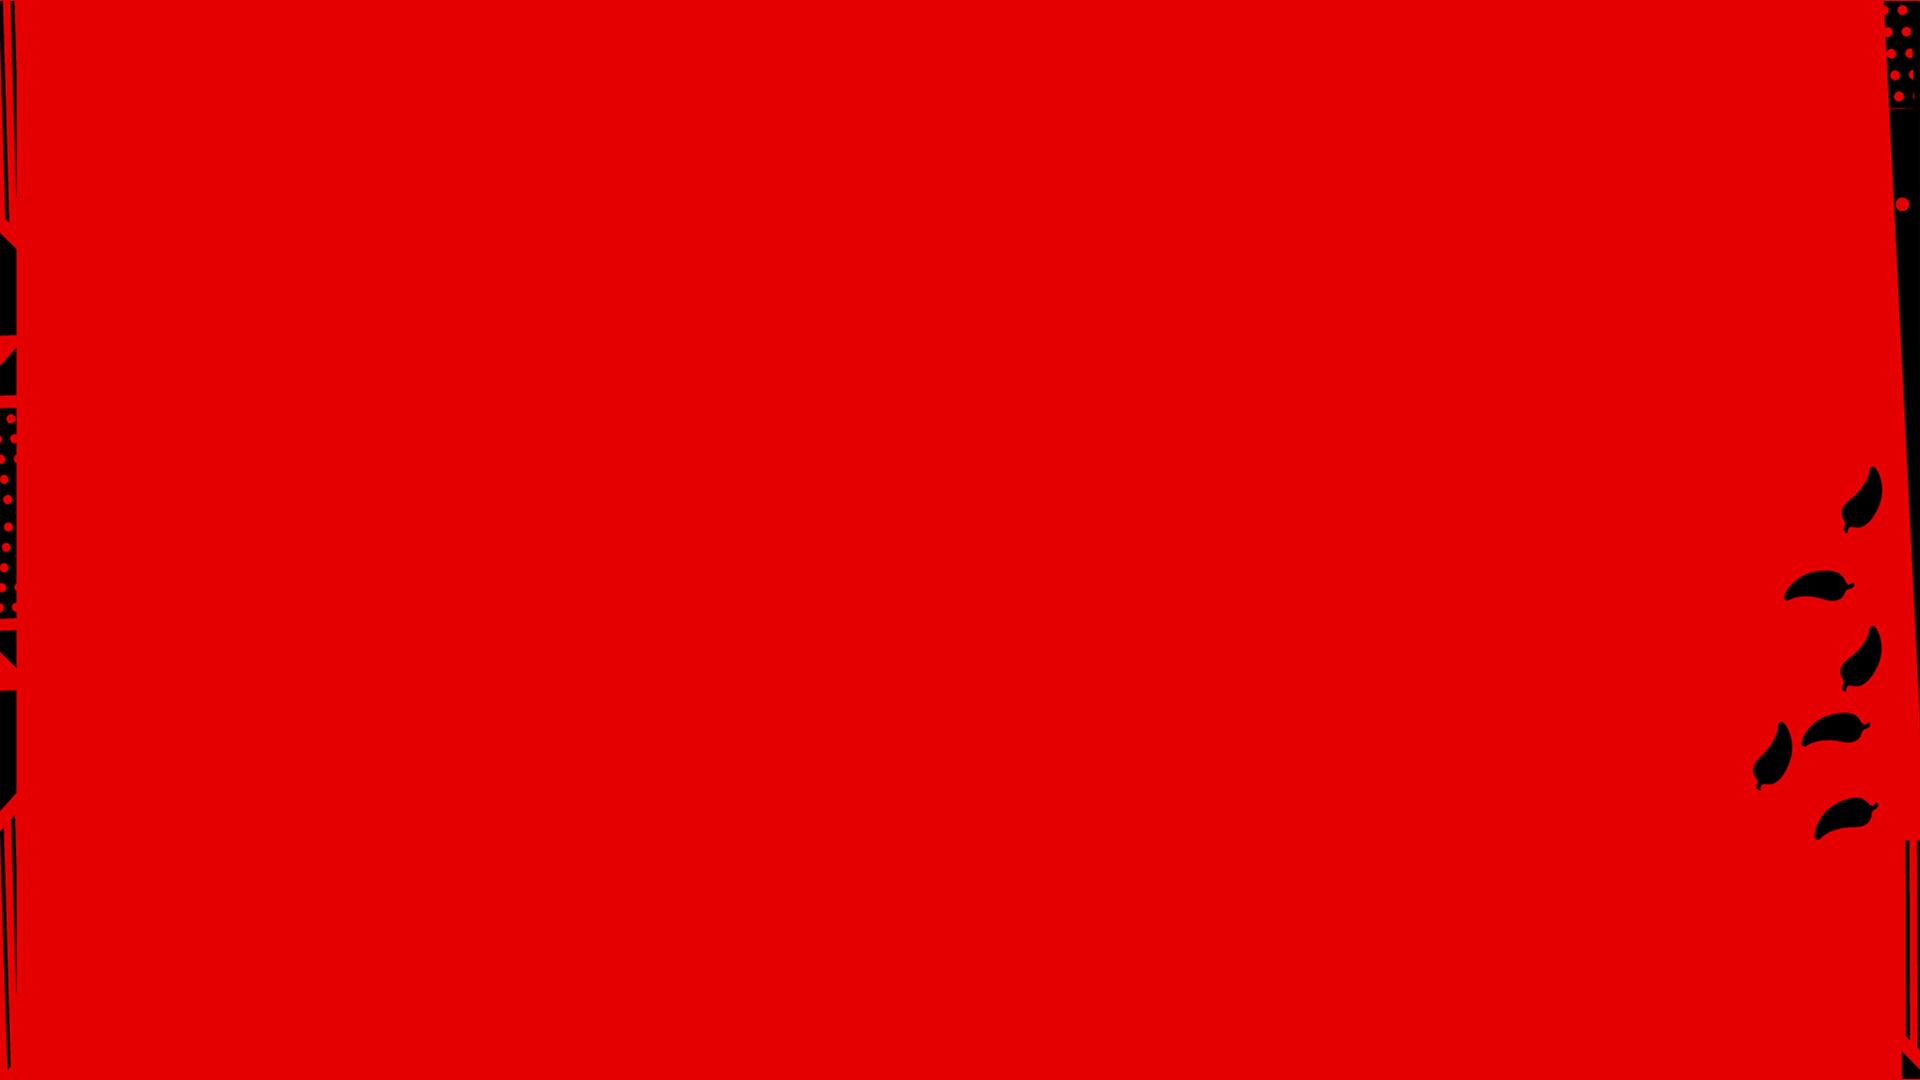 Seeing PERi-red